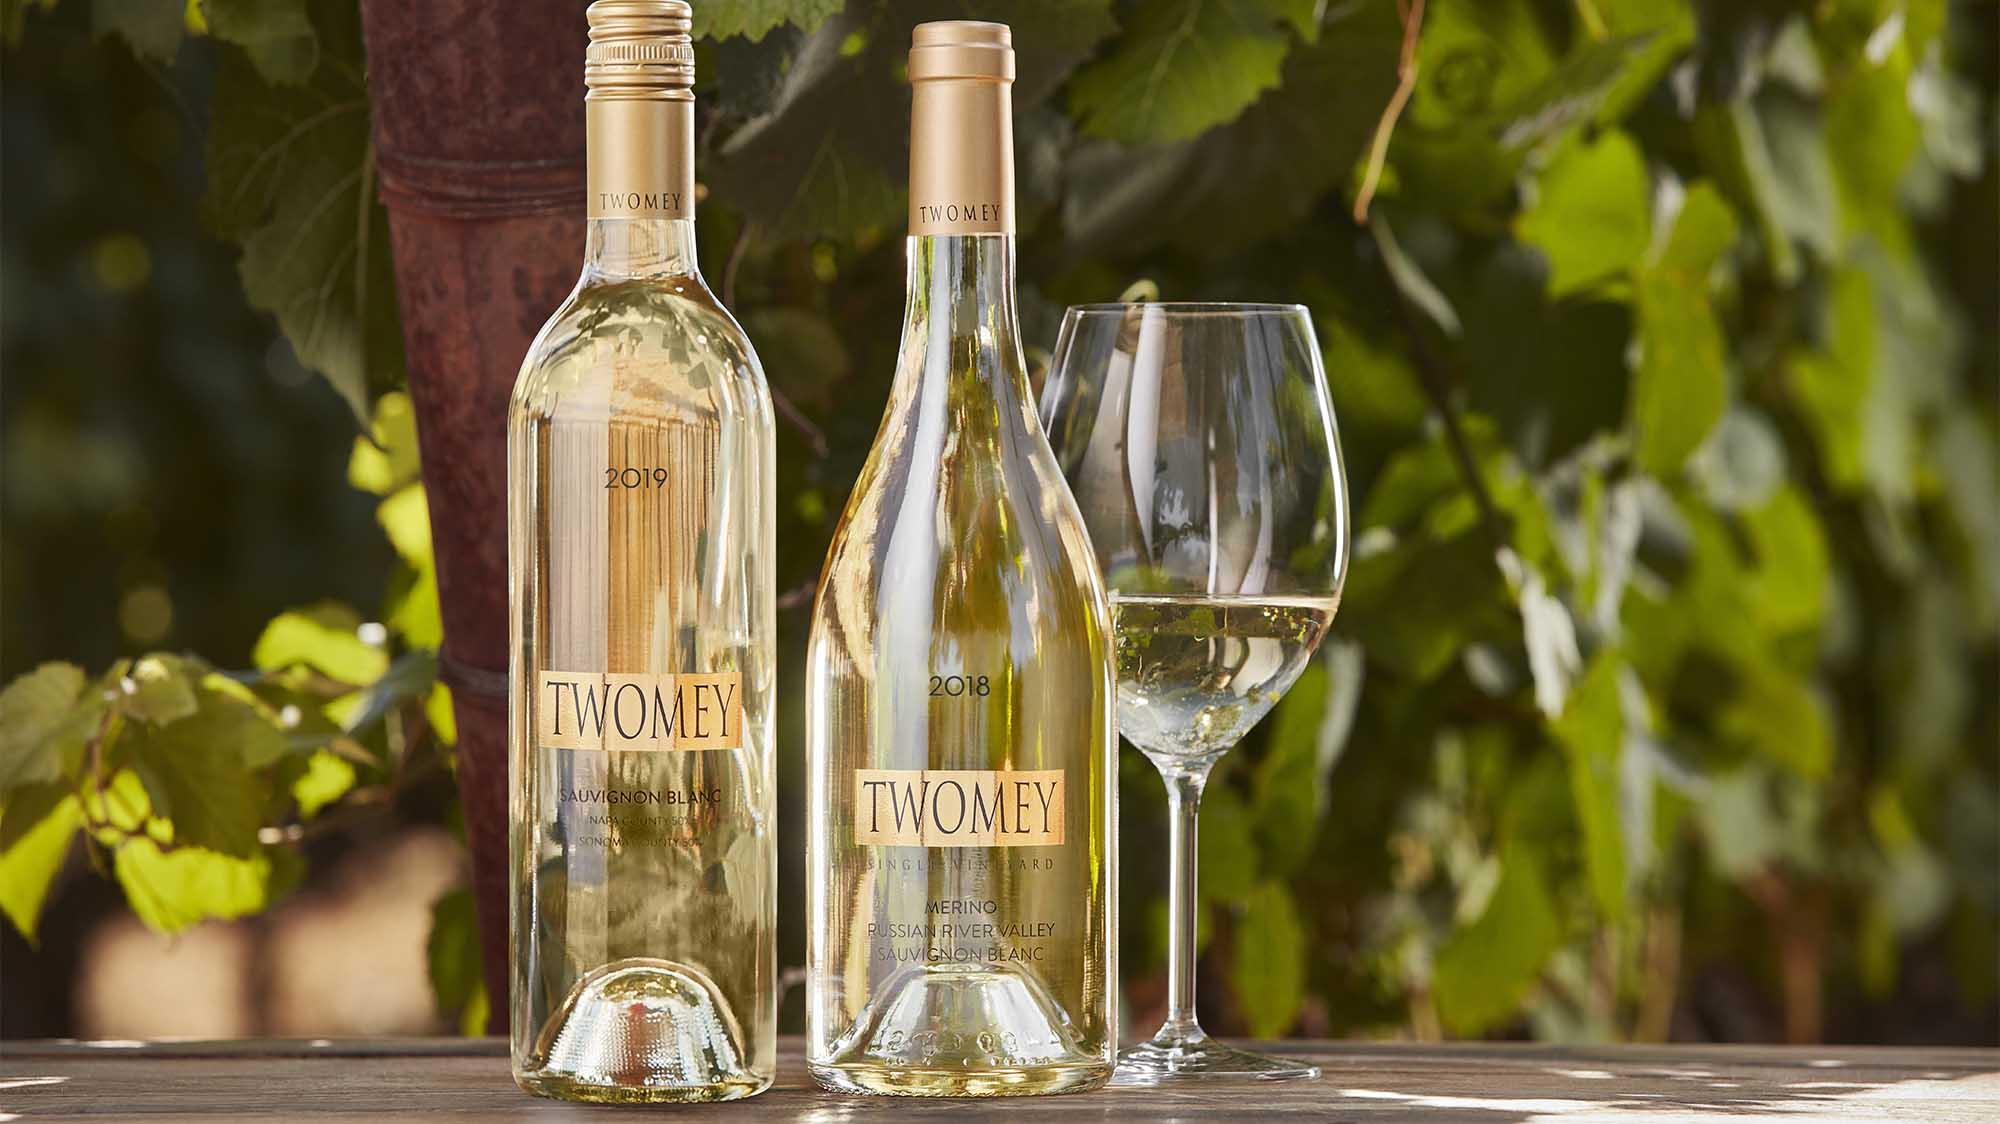 2019 Twomey Sauvignon Blanc and 2018 Merino SB